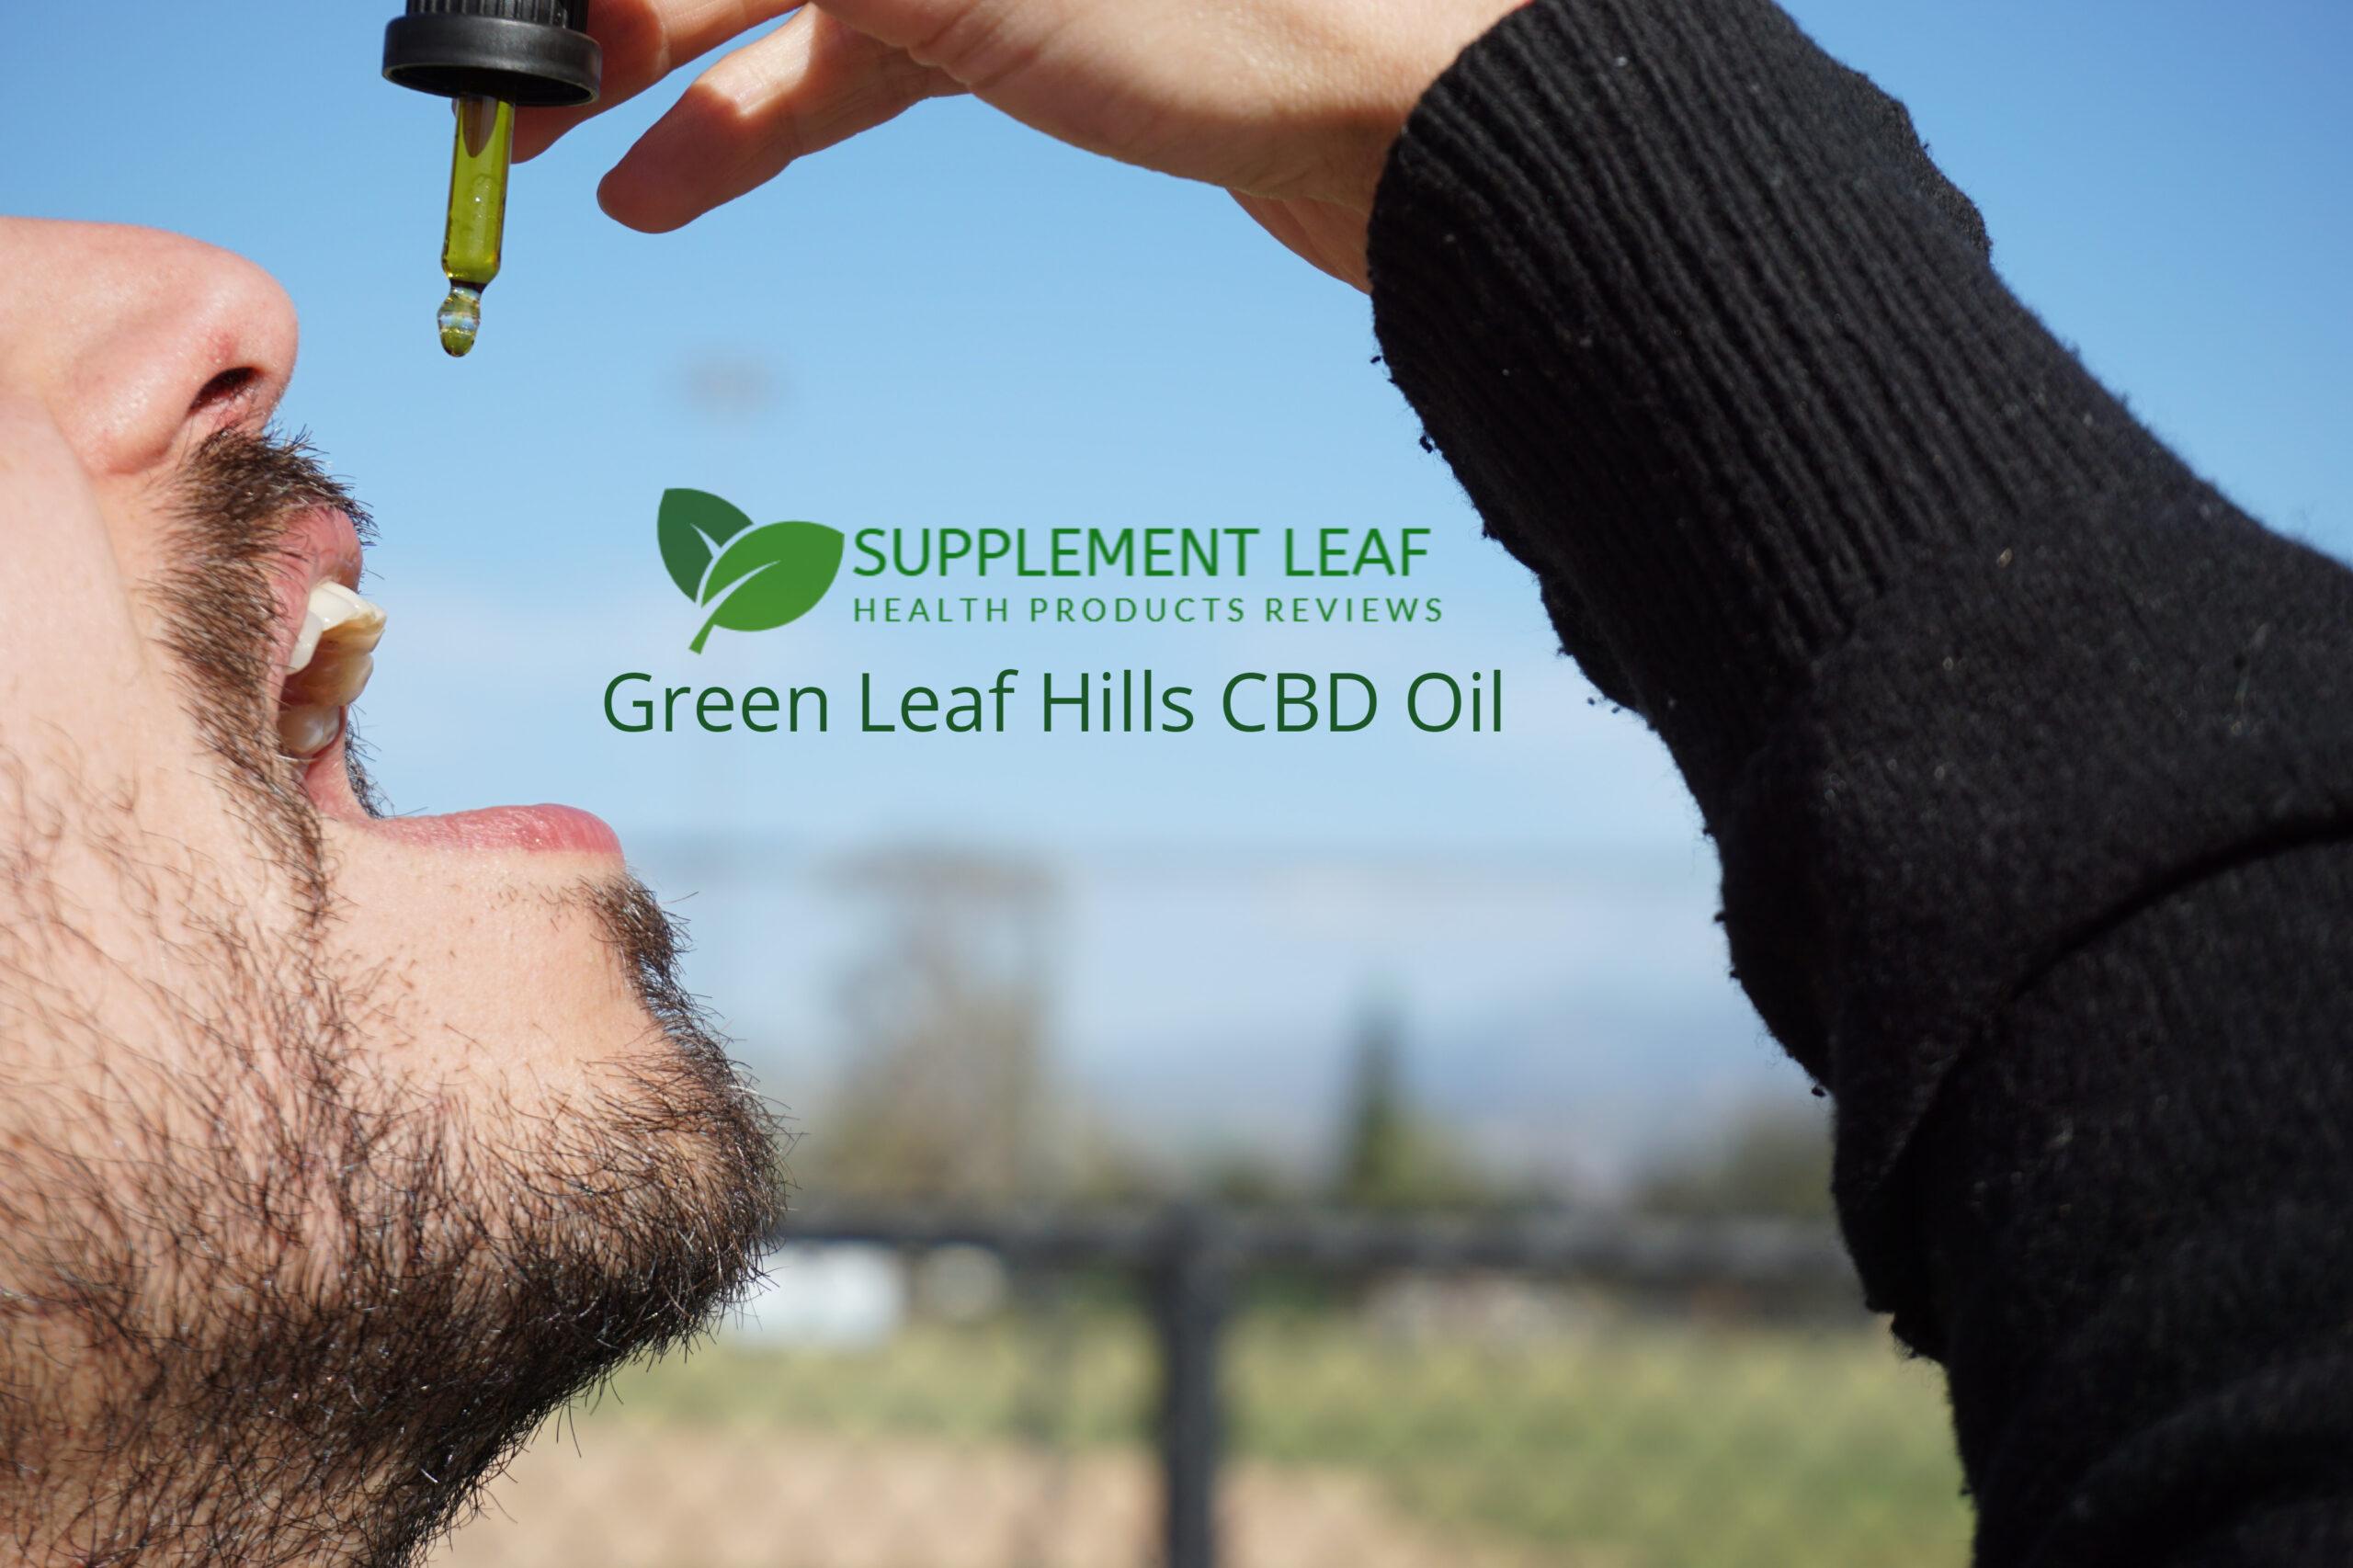 Green Leaf Hills CBD Oil